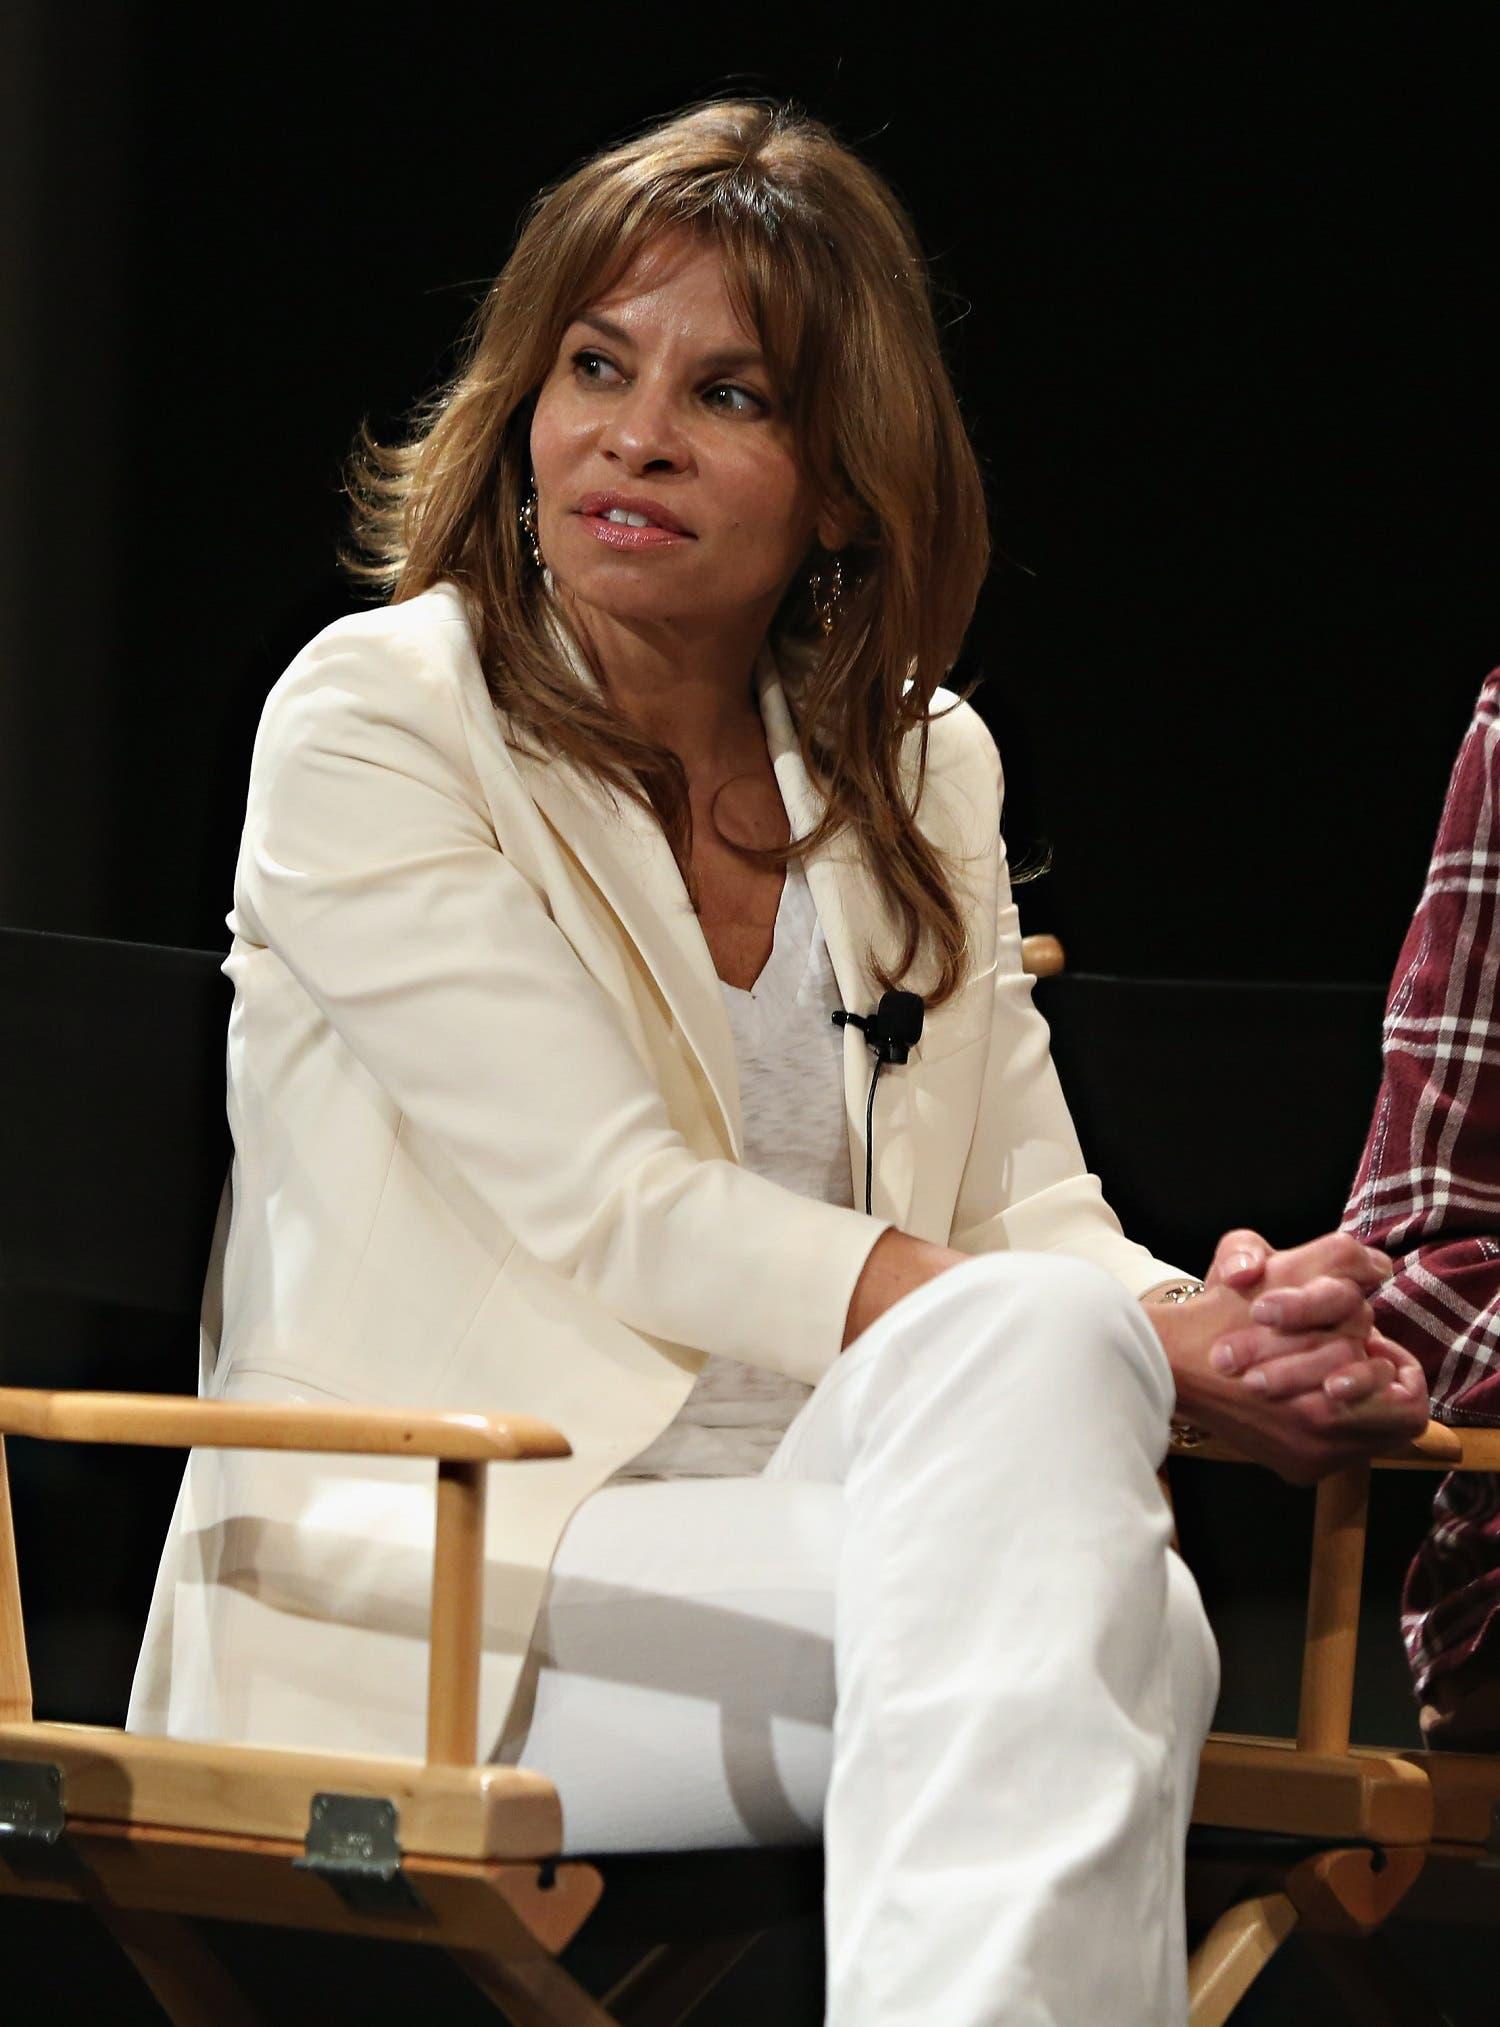 Jenny Lumet speaks during Tribeca Talks After The Movie: By Sidney Lumet, during the 2016 Tribeca Film Festival on April 22, 2016 in New York City. (AFP)